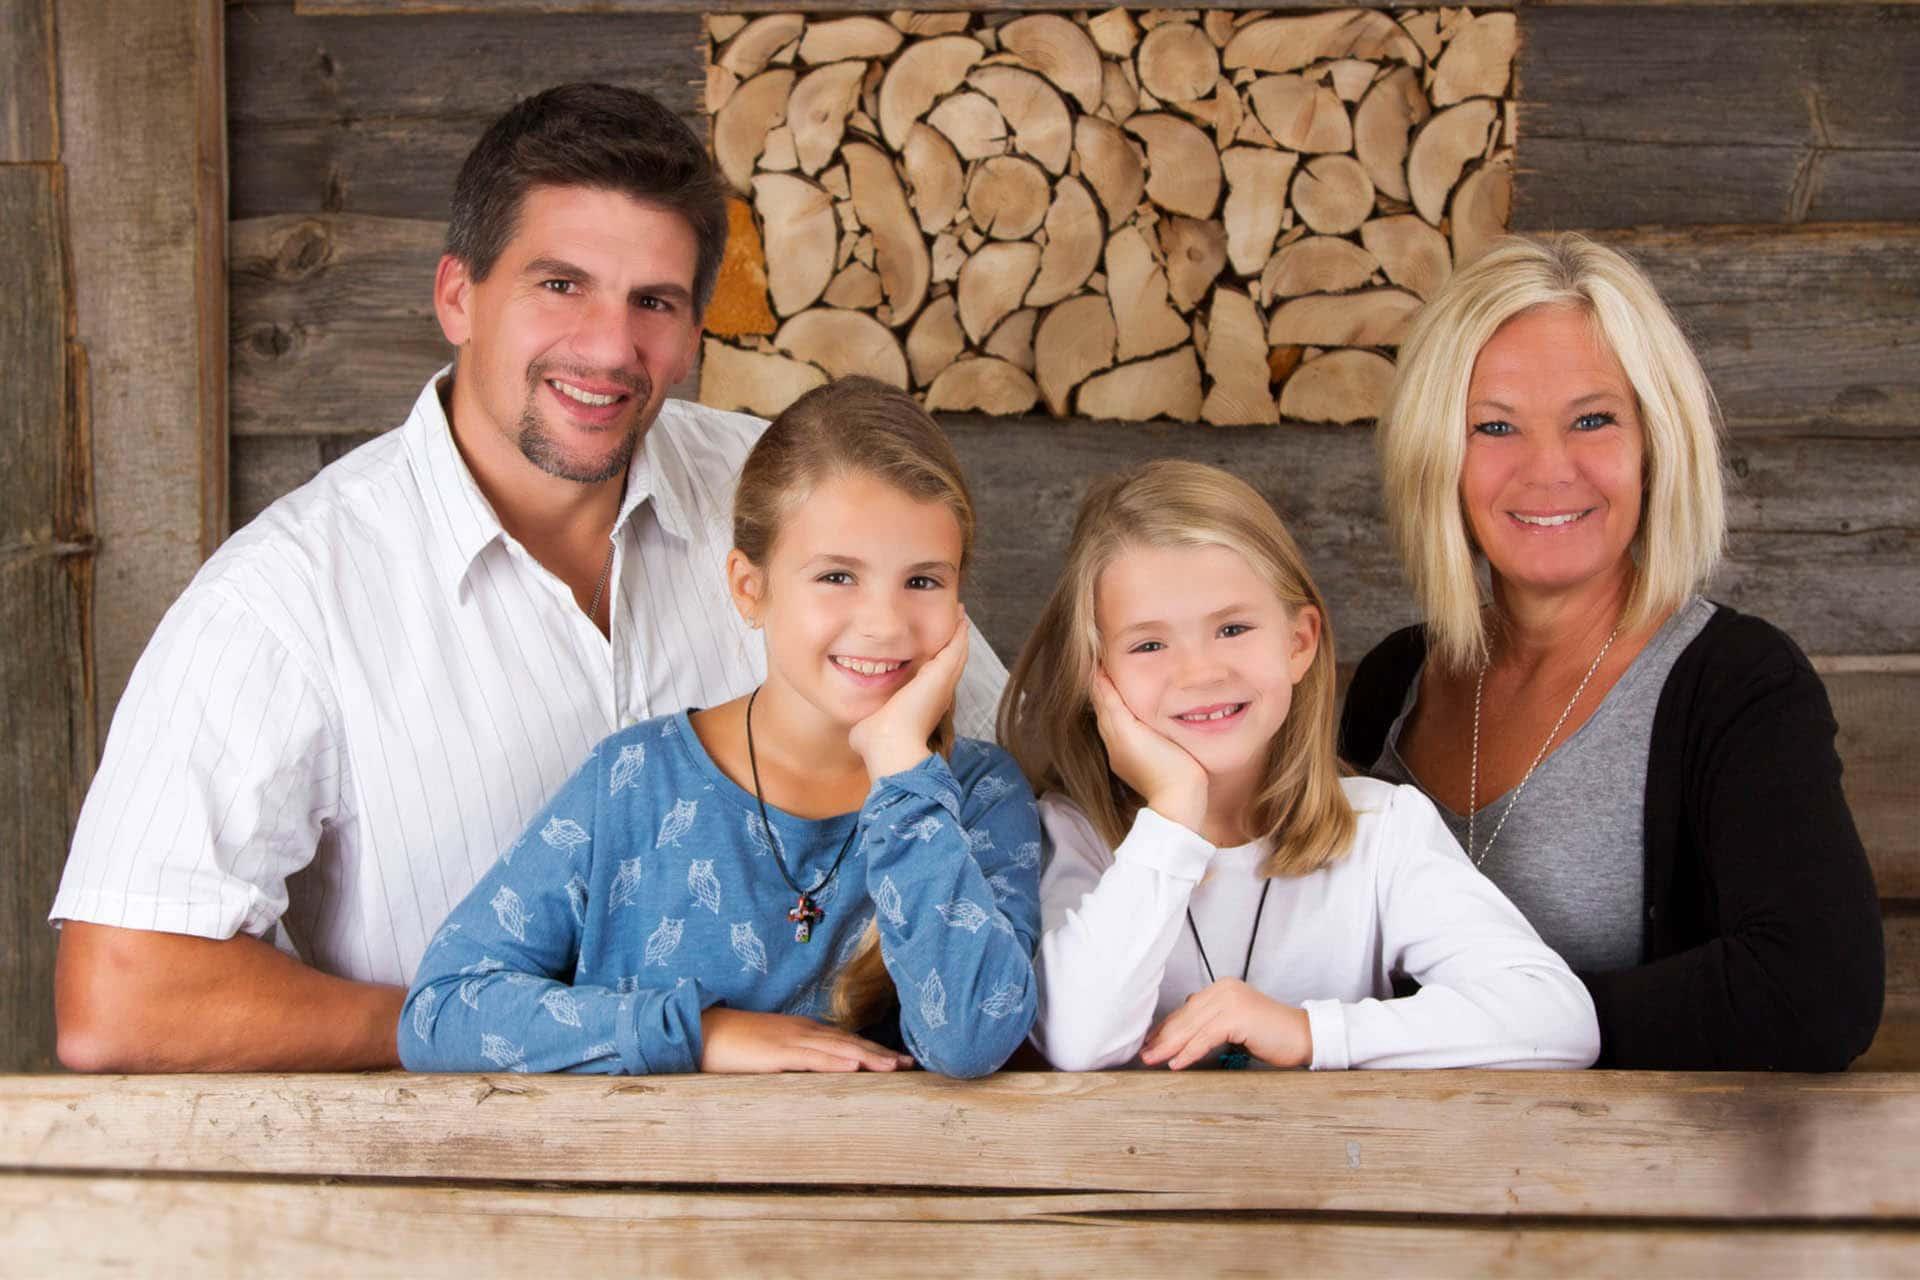 Familienfotografie - Familienfotos - Familienfotograf - Familienshooting Murnau - Foto Stoess